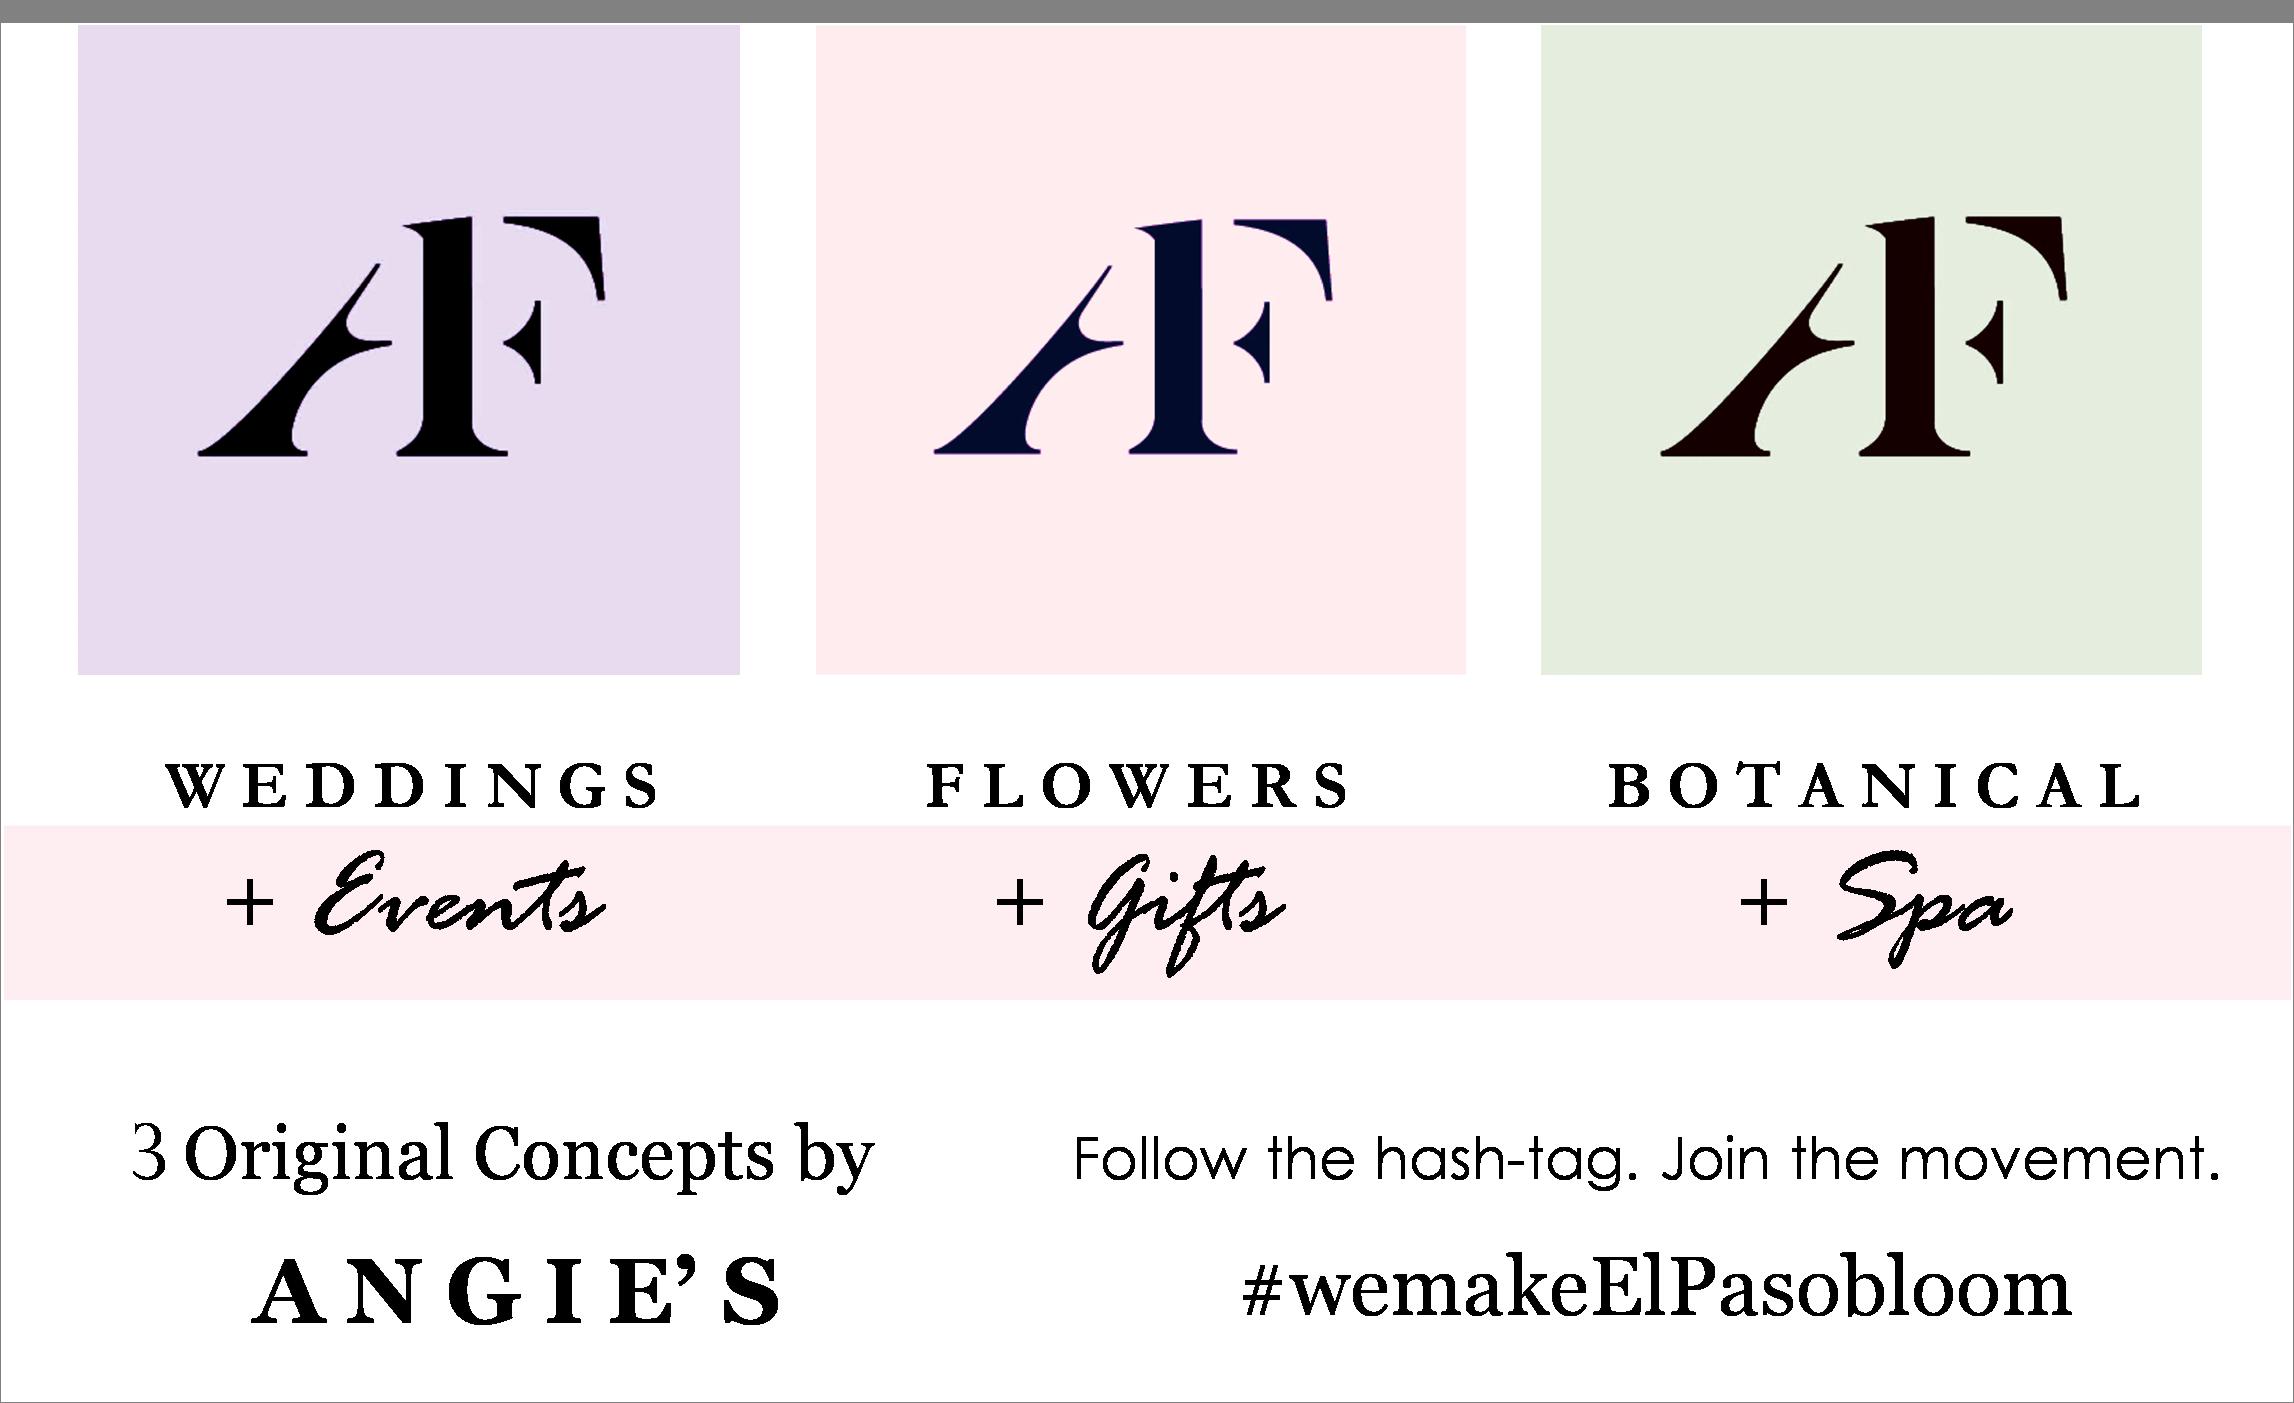 angies-floral-designs-flower-shop-el-paso-flower-delivery-79912-el-paso-florist-we-make-el-paso-bloom.png